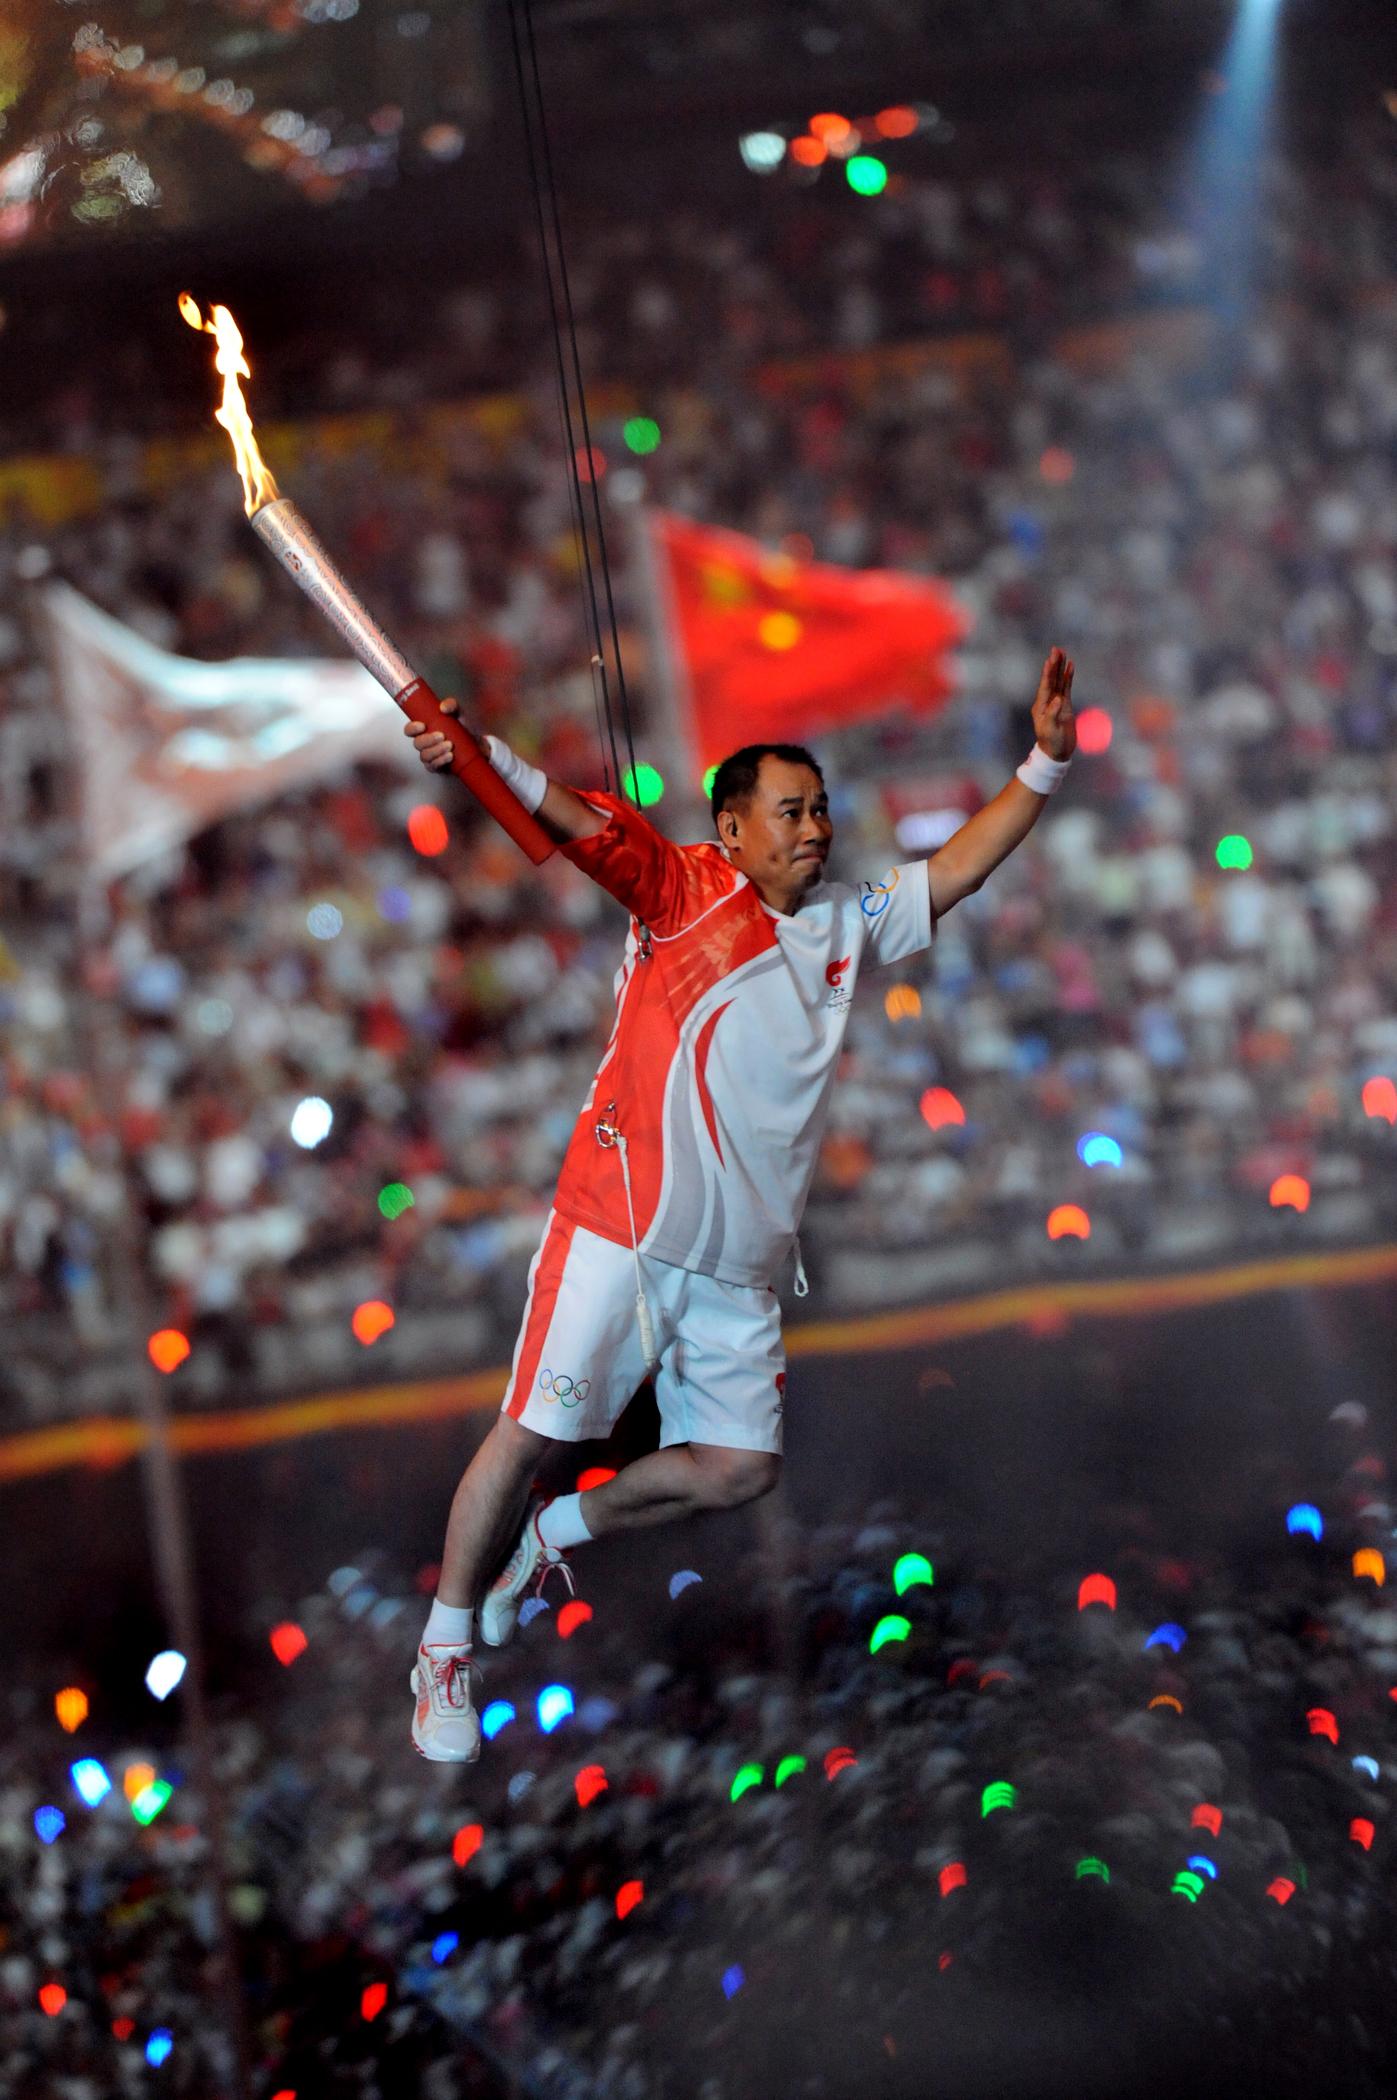 2020 Summer Olympics Opening Ceremony Performer Ranking